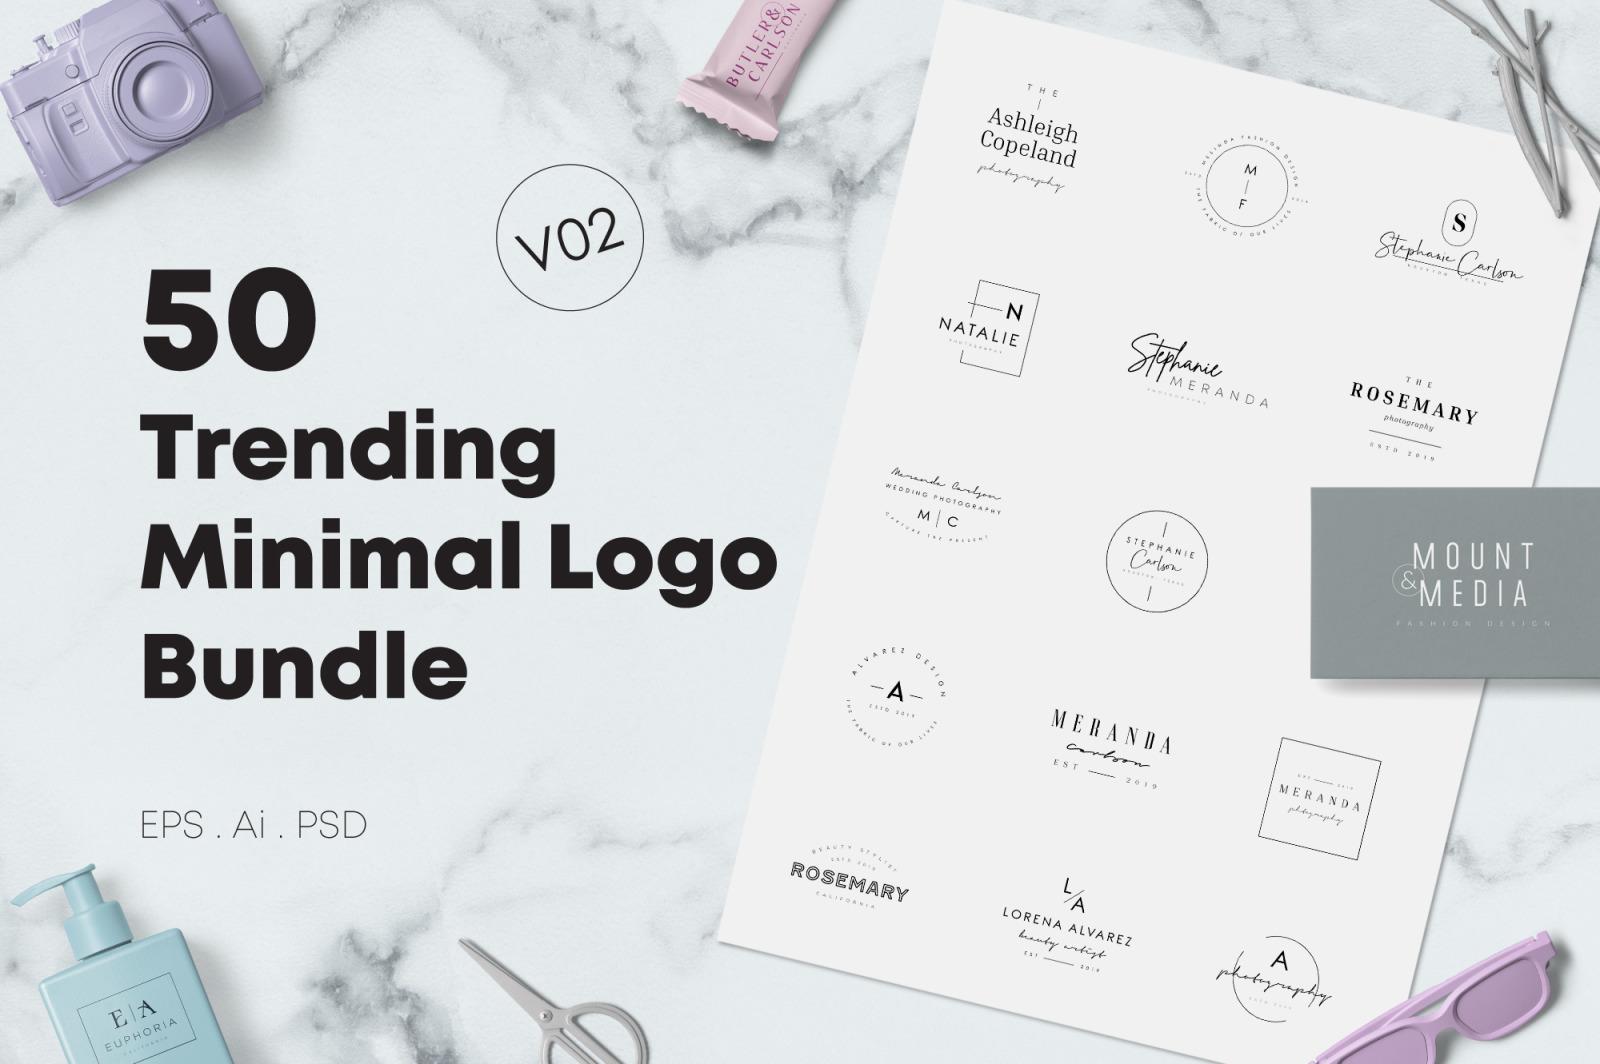 50 Trending Minimal Logo Bundle V02